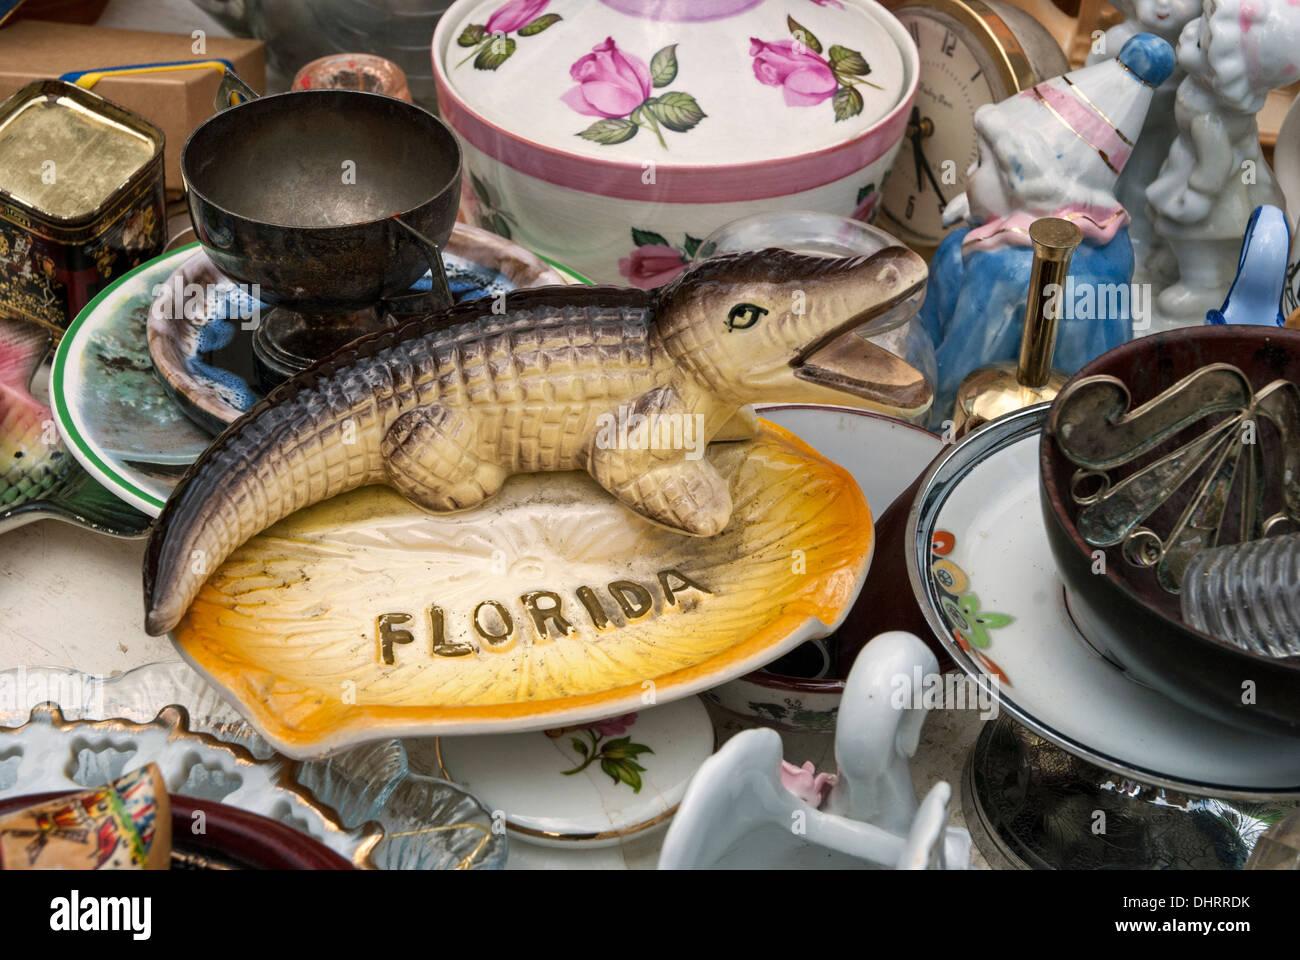 Souvenir from Florida on a bric-a-brac stall in the Grassmarket in Edinburgh, Scotland, UK. - Stock Image